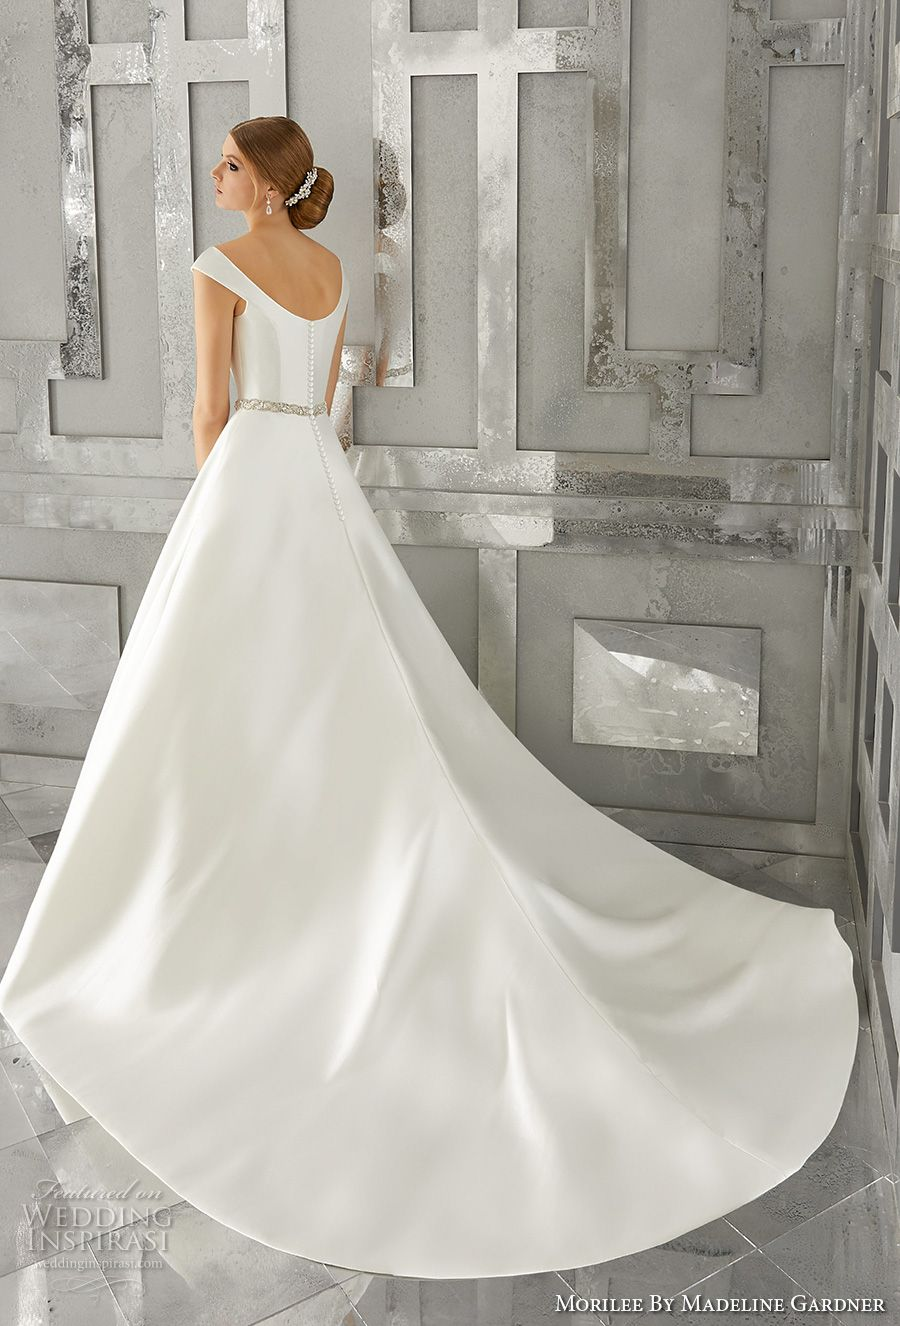 Morilee By Madeline Gardner Fall 2017 Wedding Dresses Wedding Inspirasi Mori Lee Wedding Dress Wedding Dress Styles Summer Wedding Dress Beach [ 1326 x 900 Pixel ]